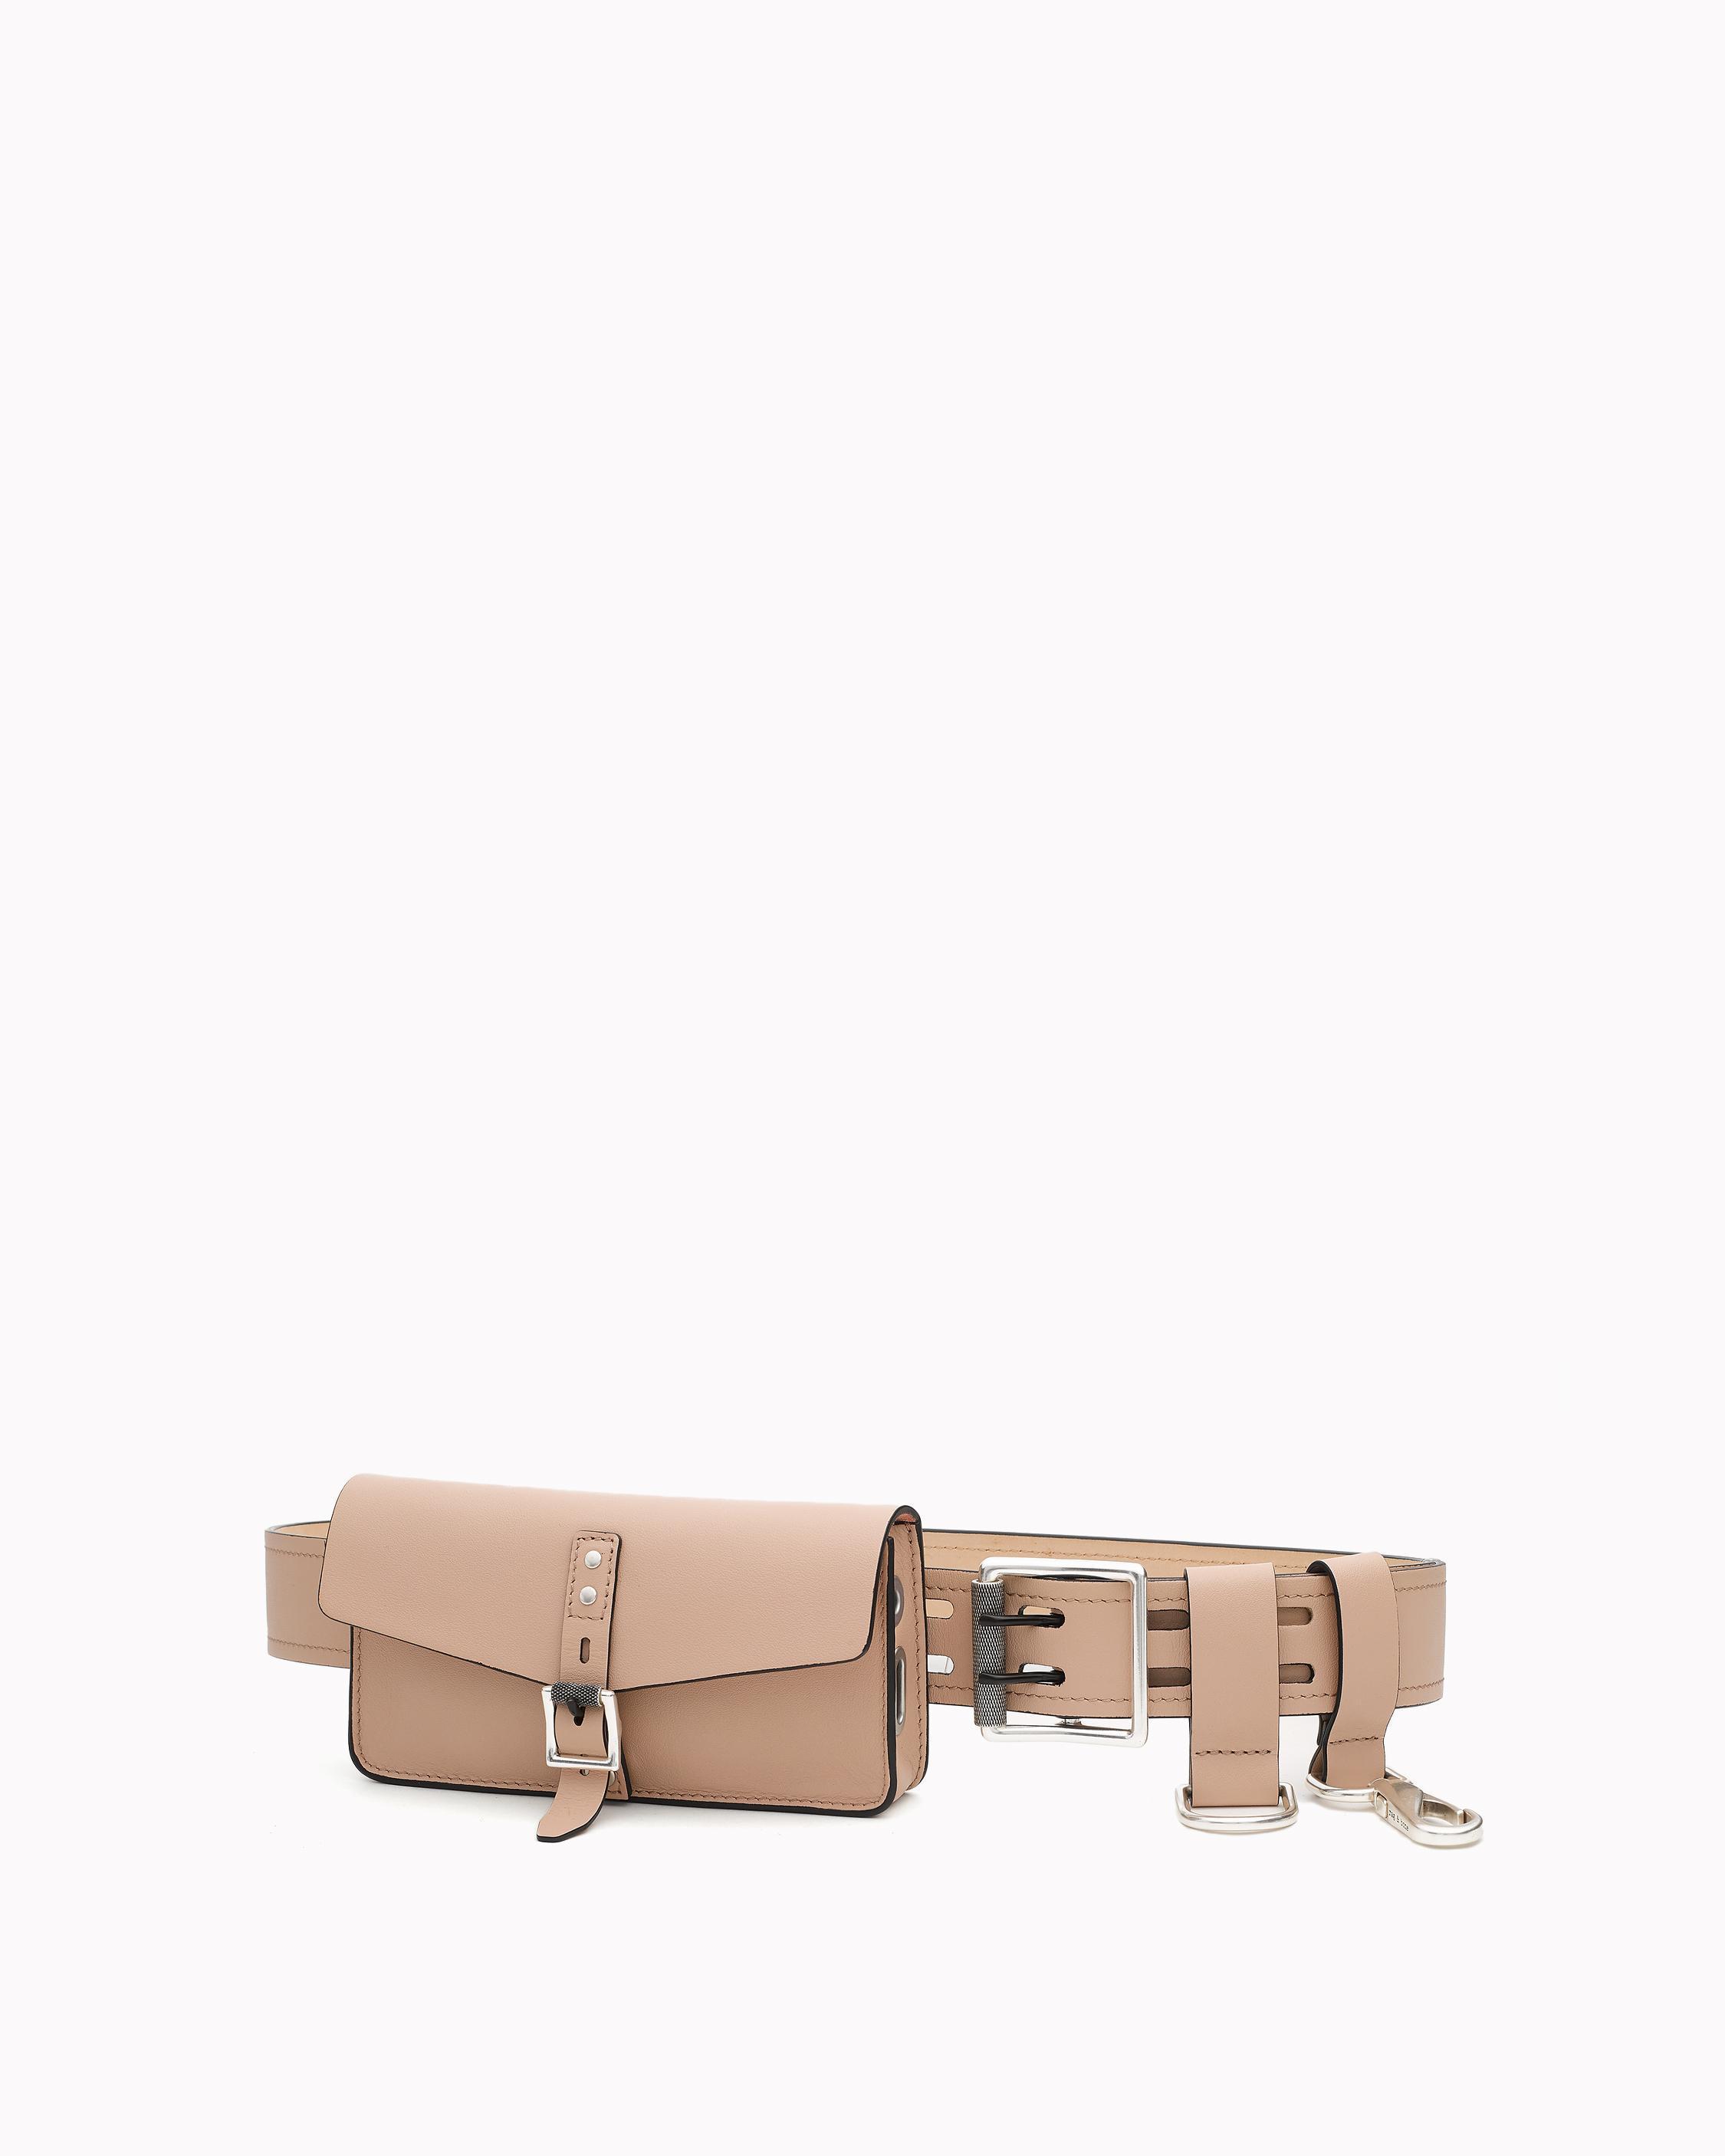 Small Leather Goods - Belts Botondi Milano JRdscktW